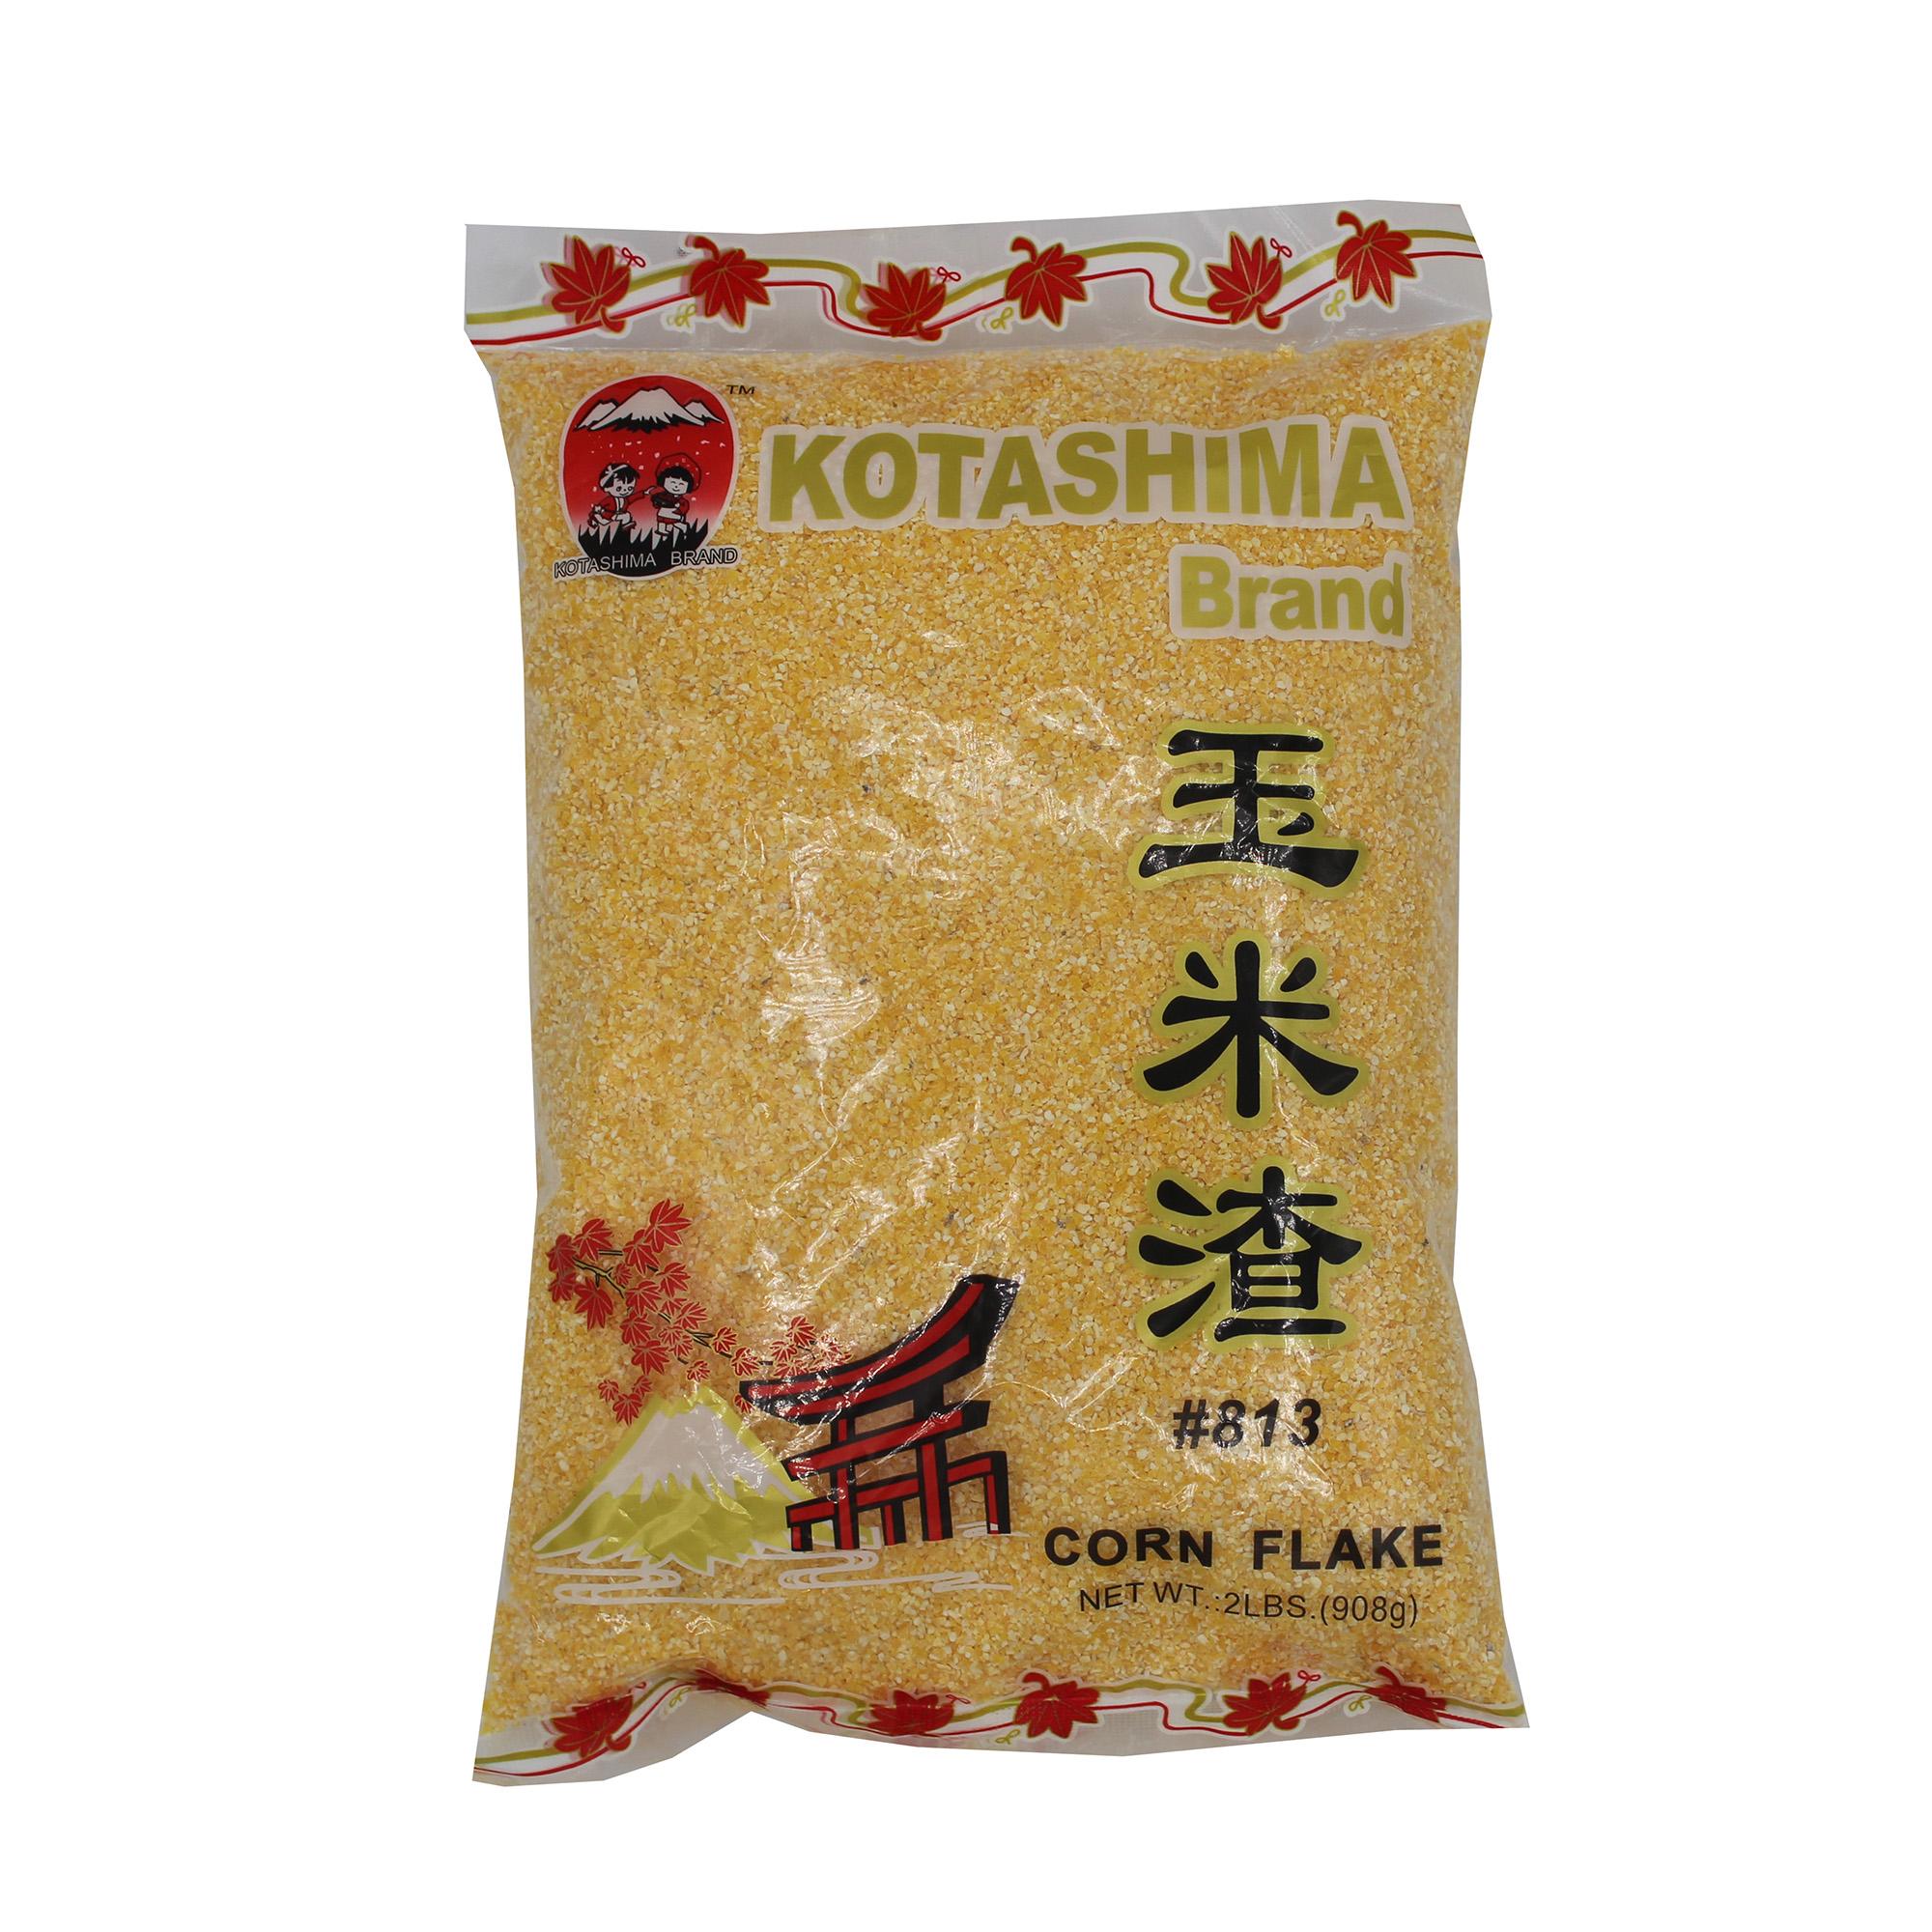 medium kotashima corn flakes 2 lbs OjNBMQ1Ch